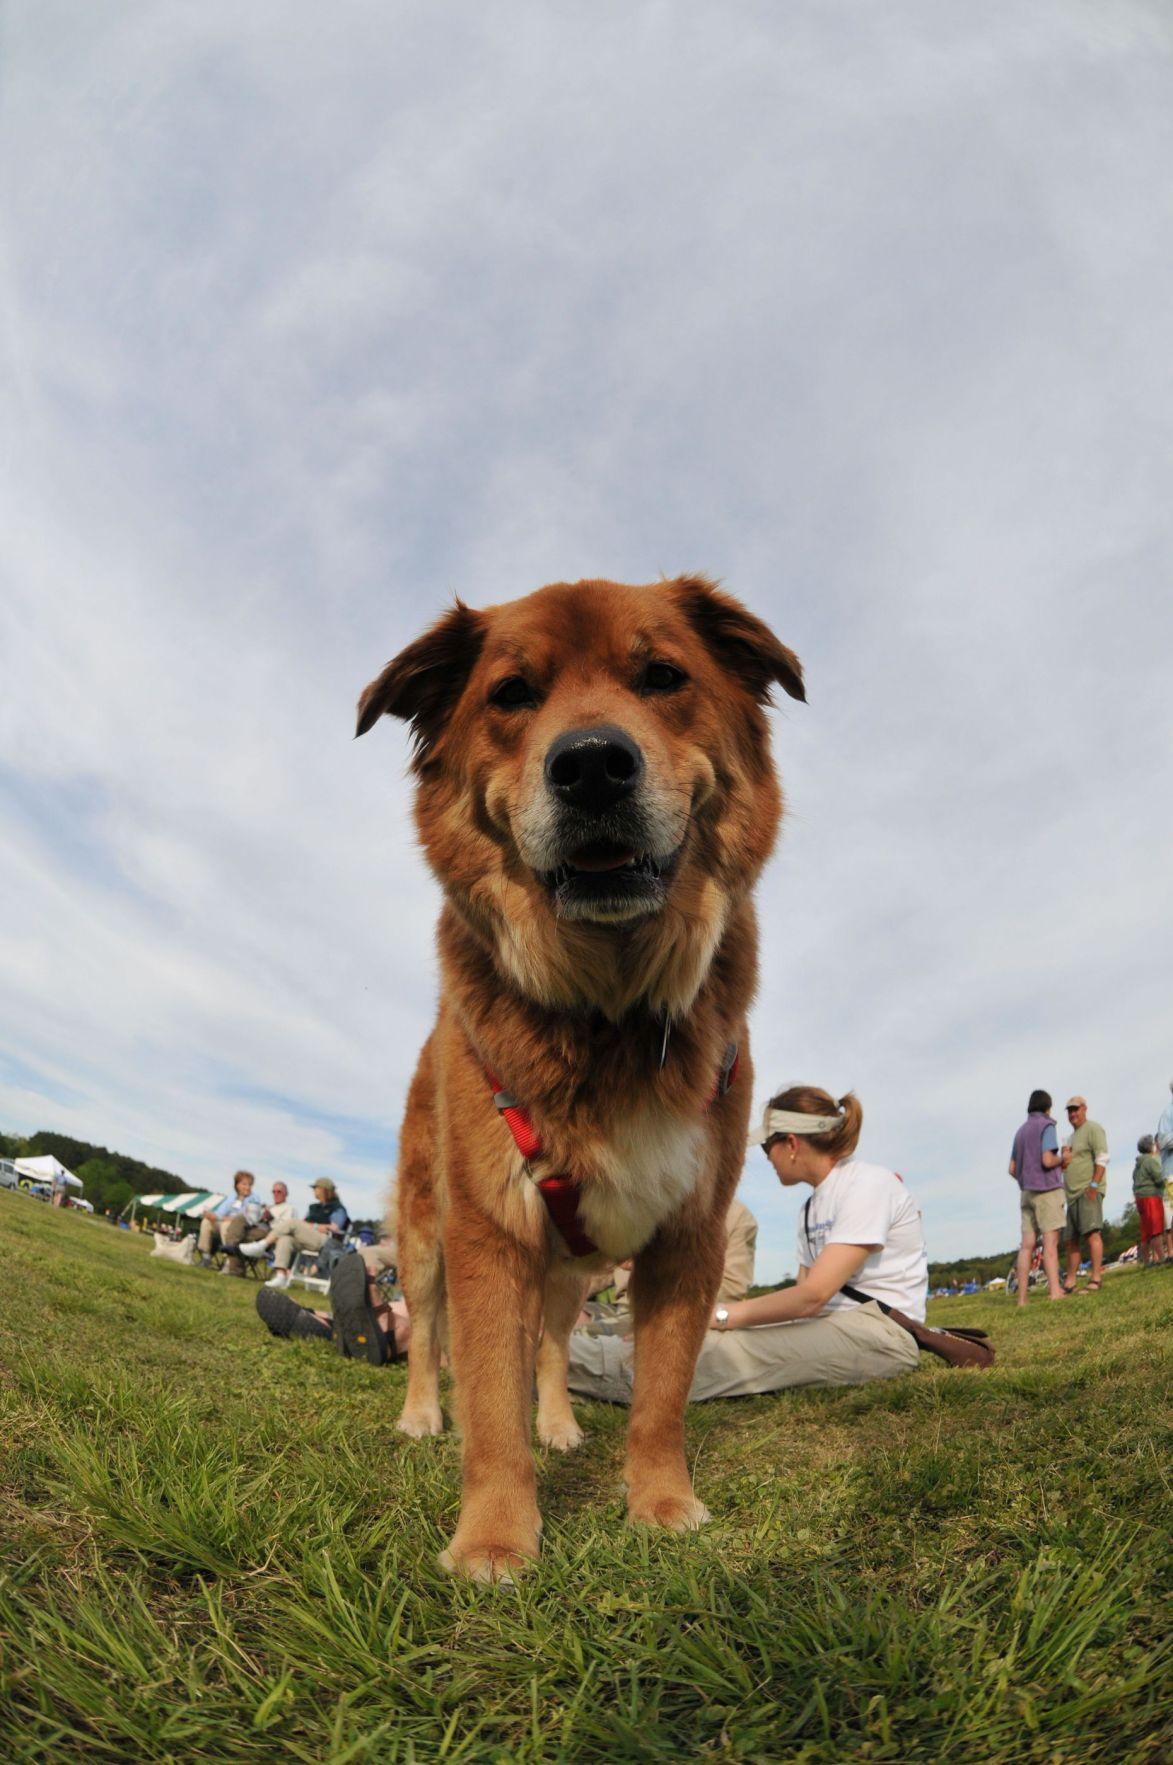 Dog-friendly summer series returns to James Island